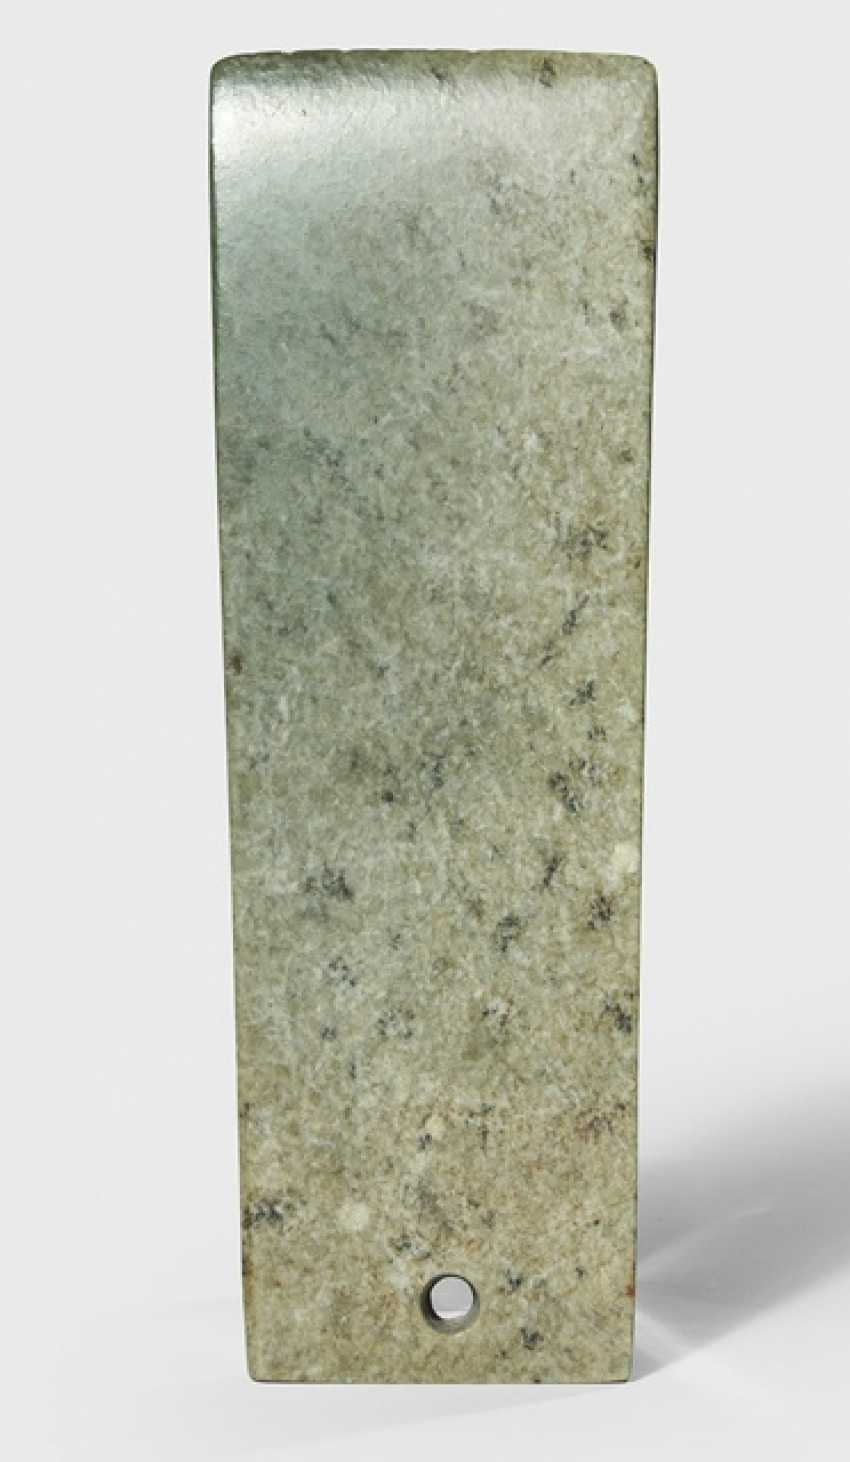 Gray-green ceremonial blade made of Jade - photo 1